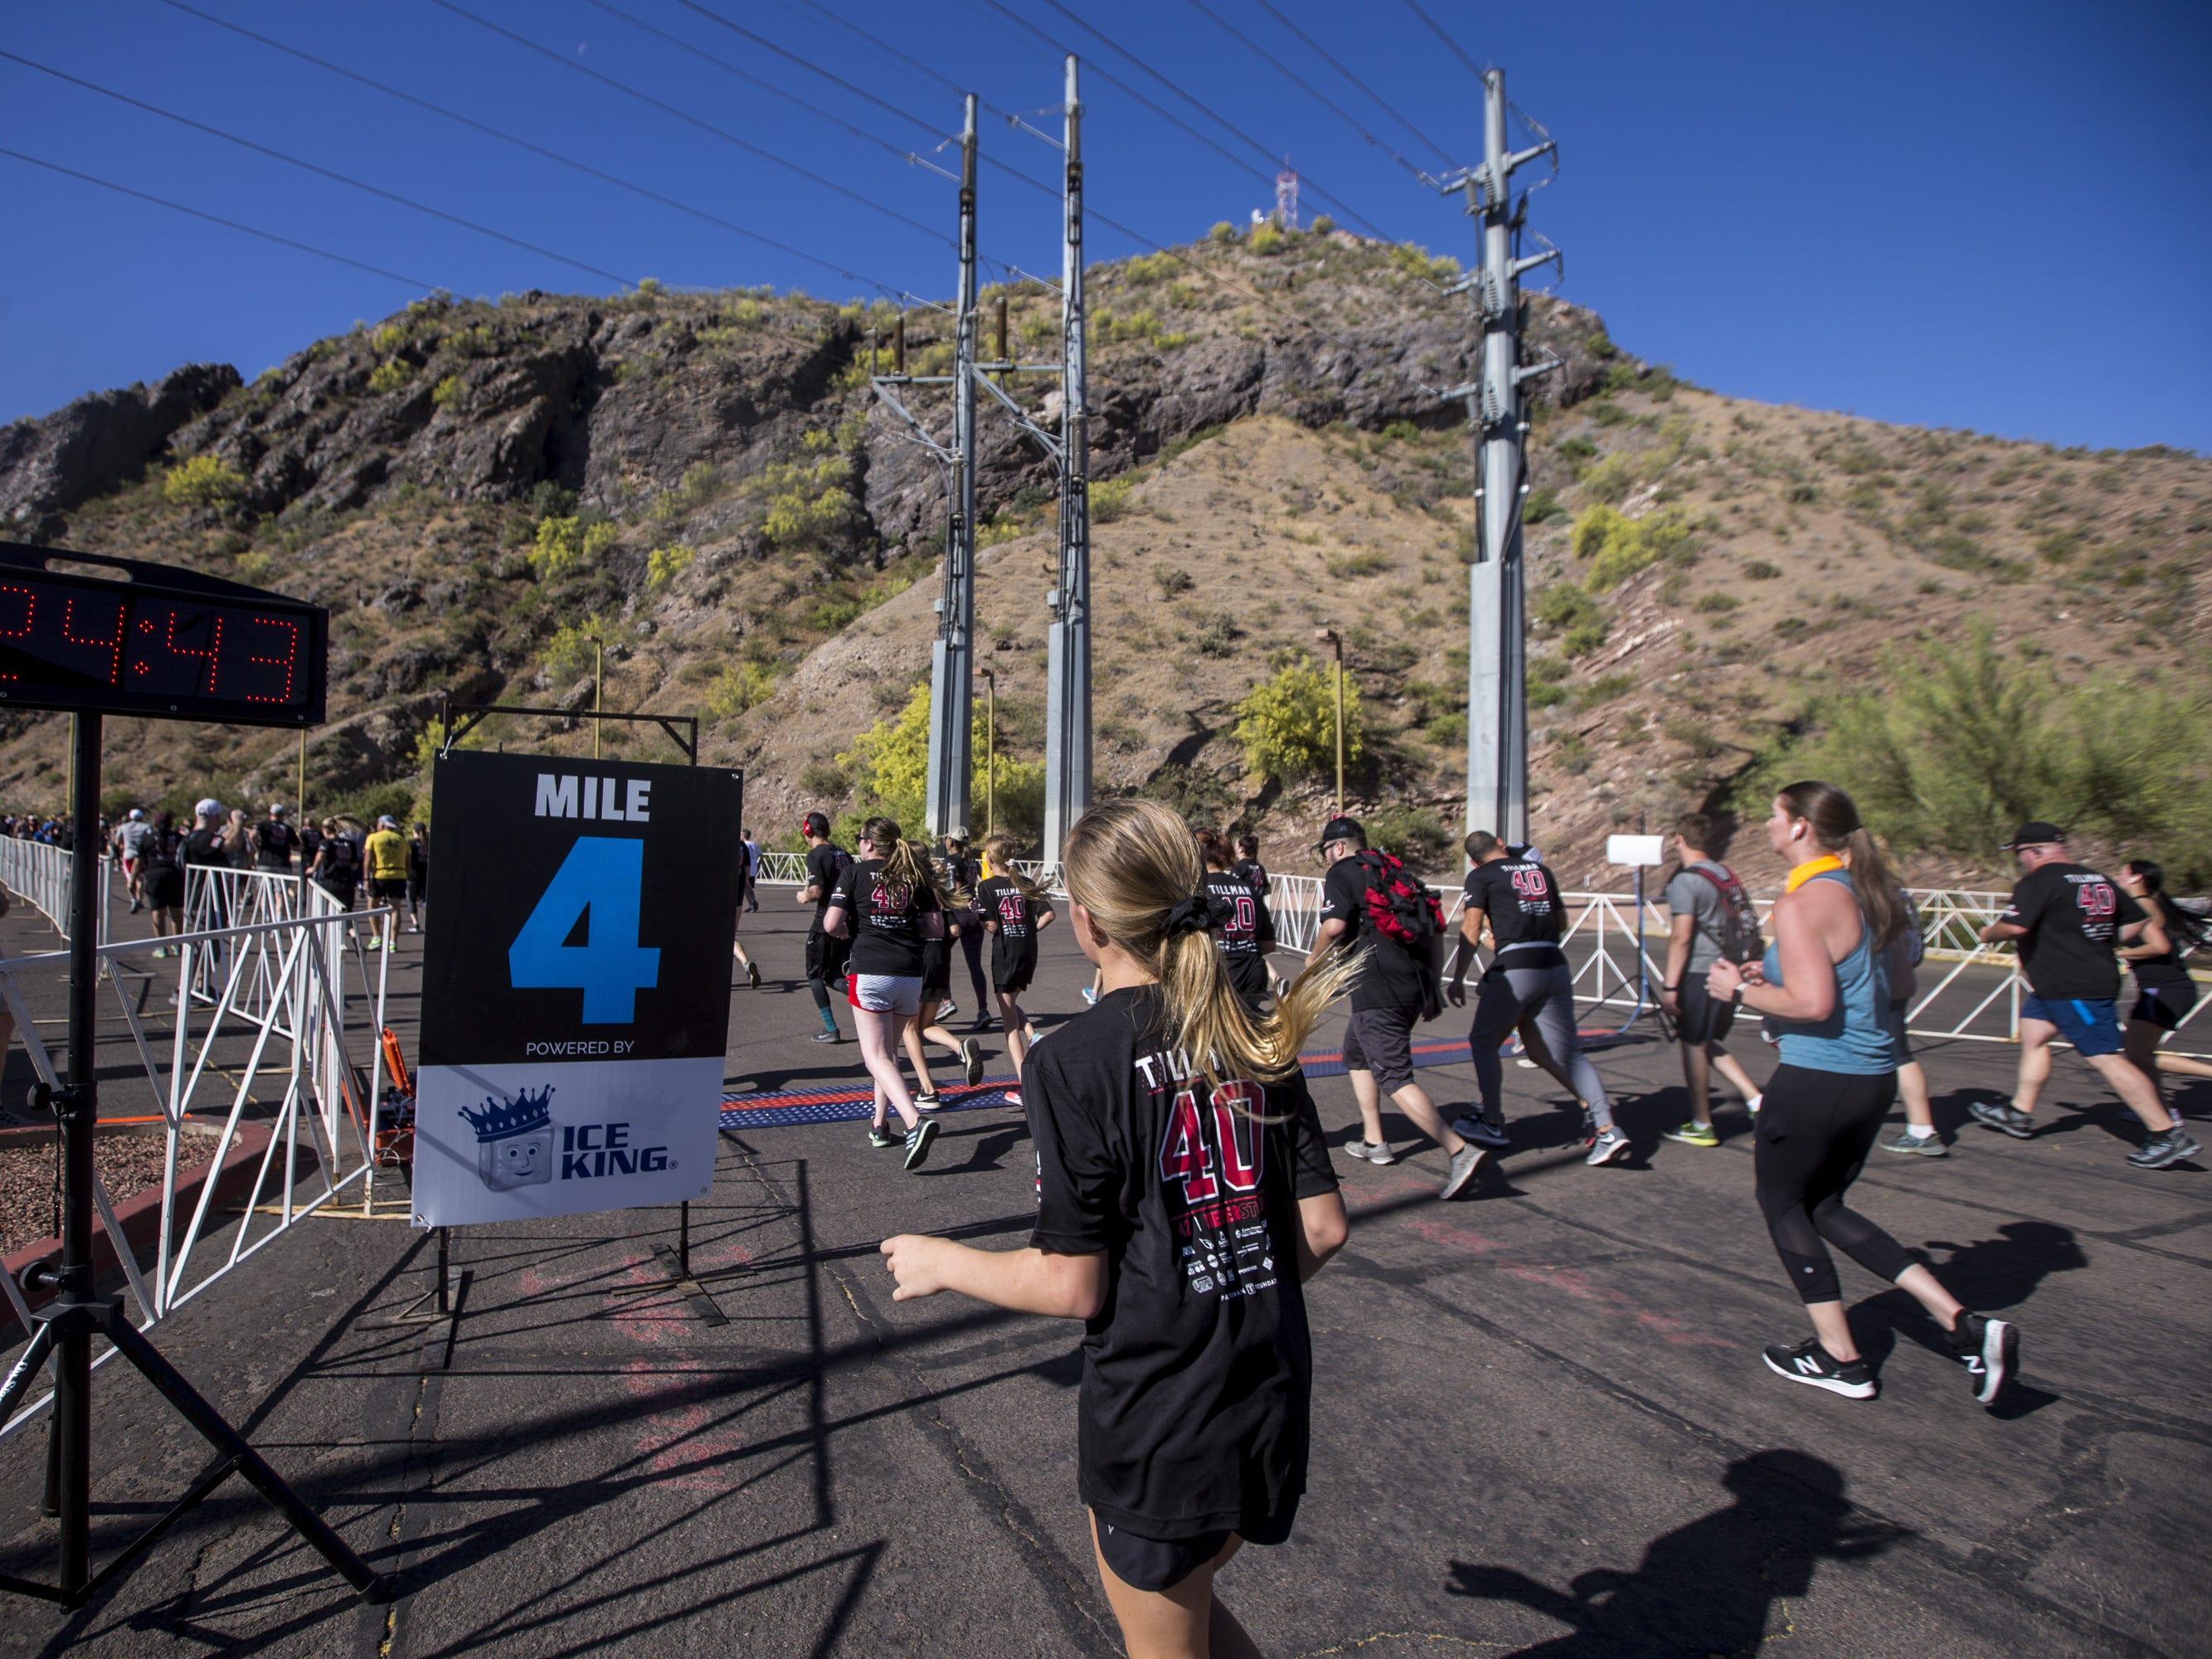 Participants run toward Sun Devil Stadium during the 15th Annual Pat's Run on Saturday, April 27, 2019, in Tempe, Ariz.